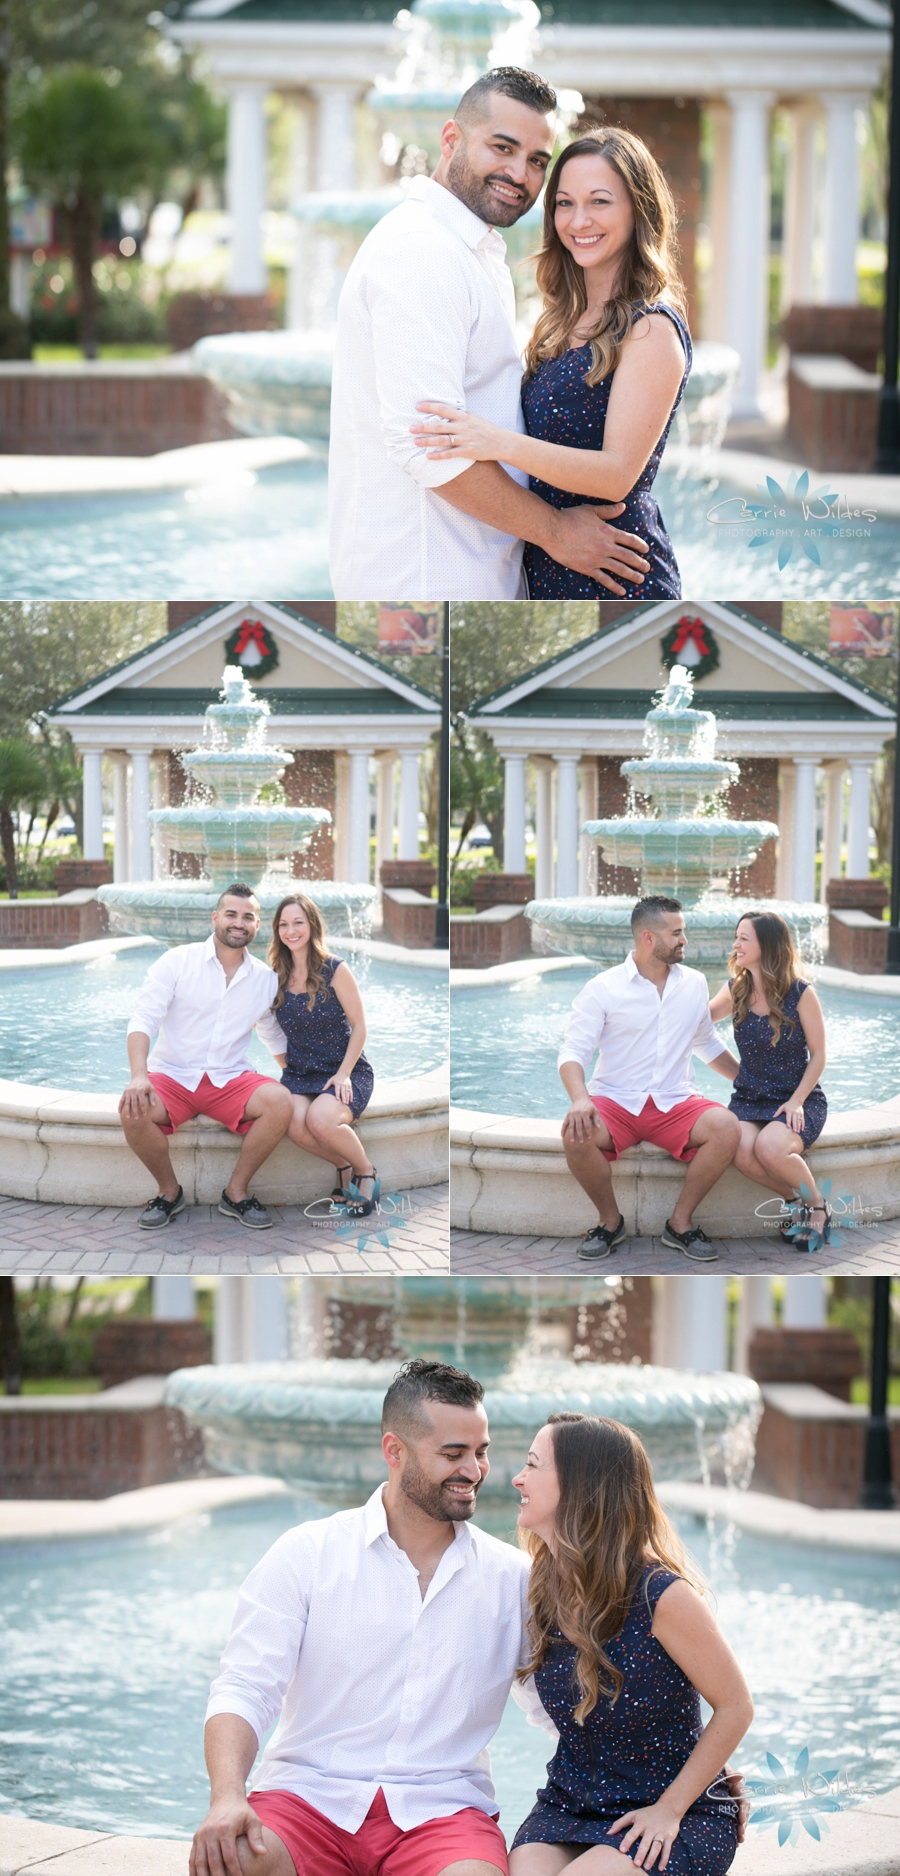 100% Chiropractic Tampa_0001.jpg